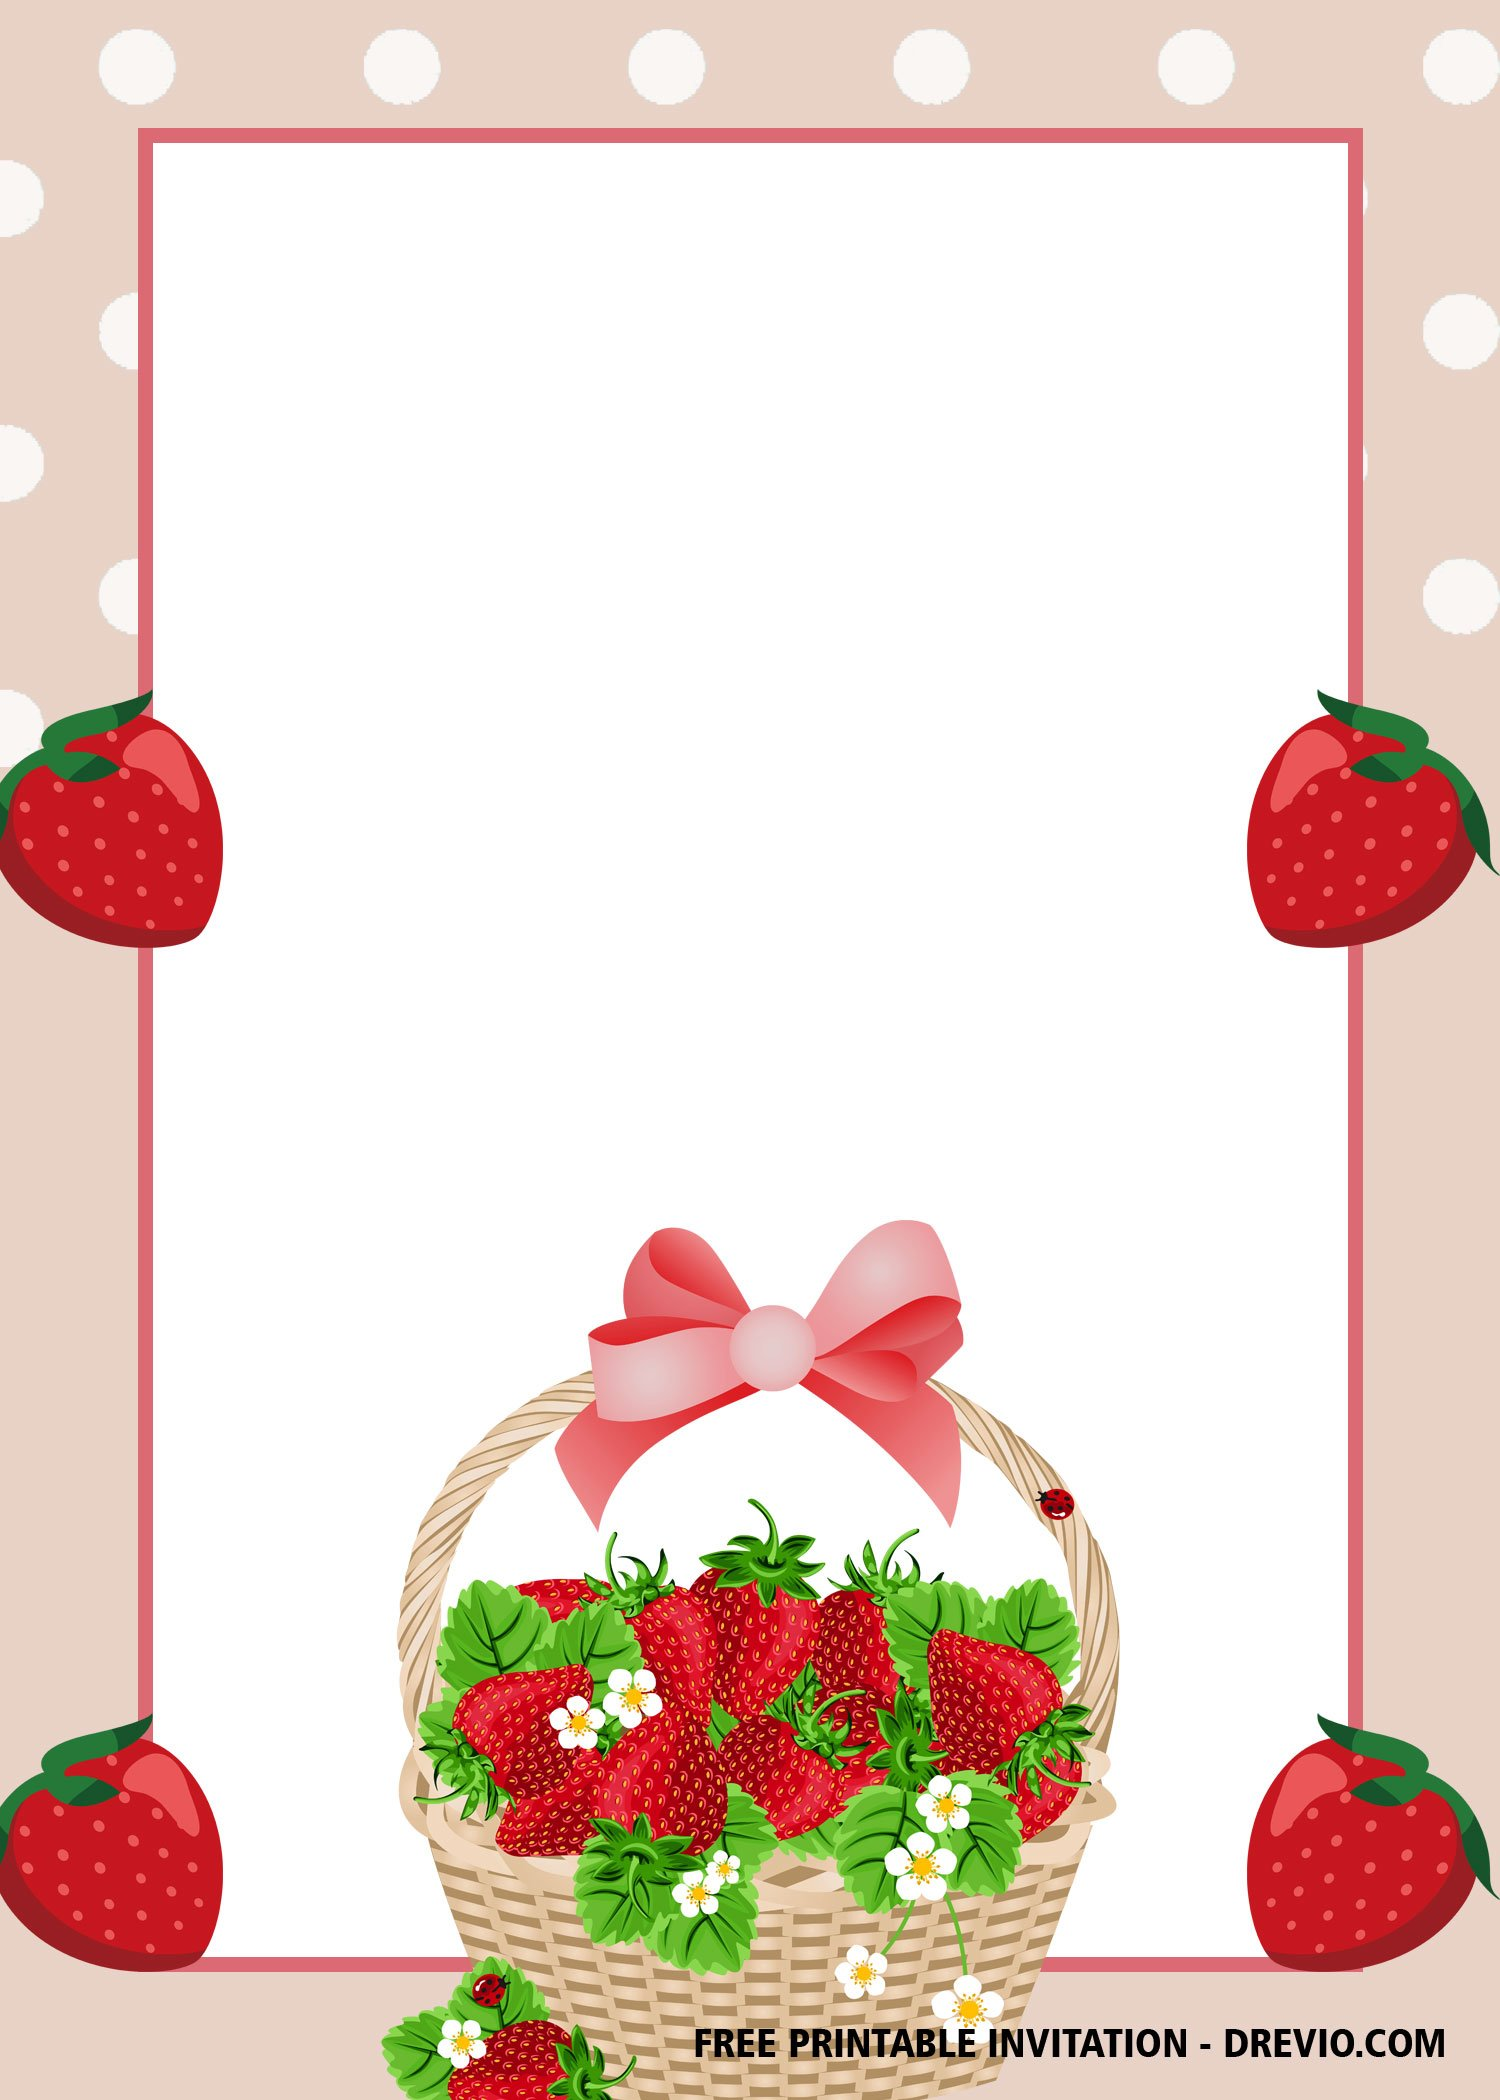 Free Printable Strawberry Invitation Templates